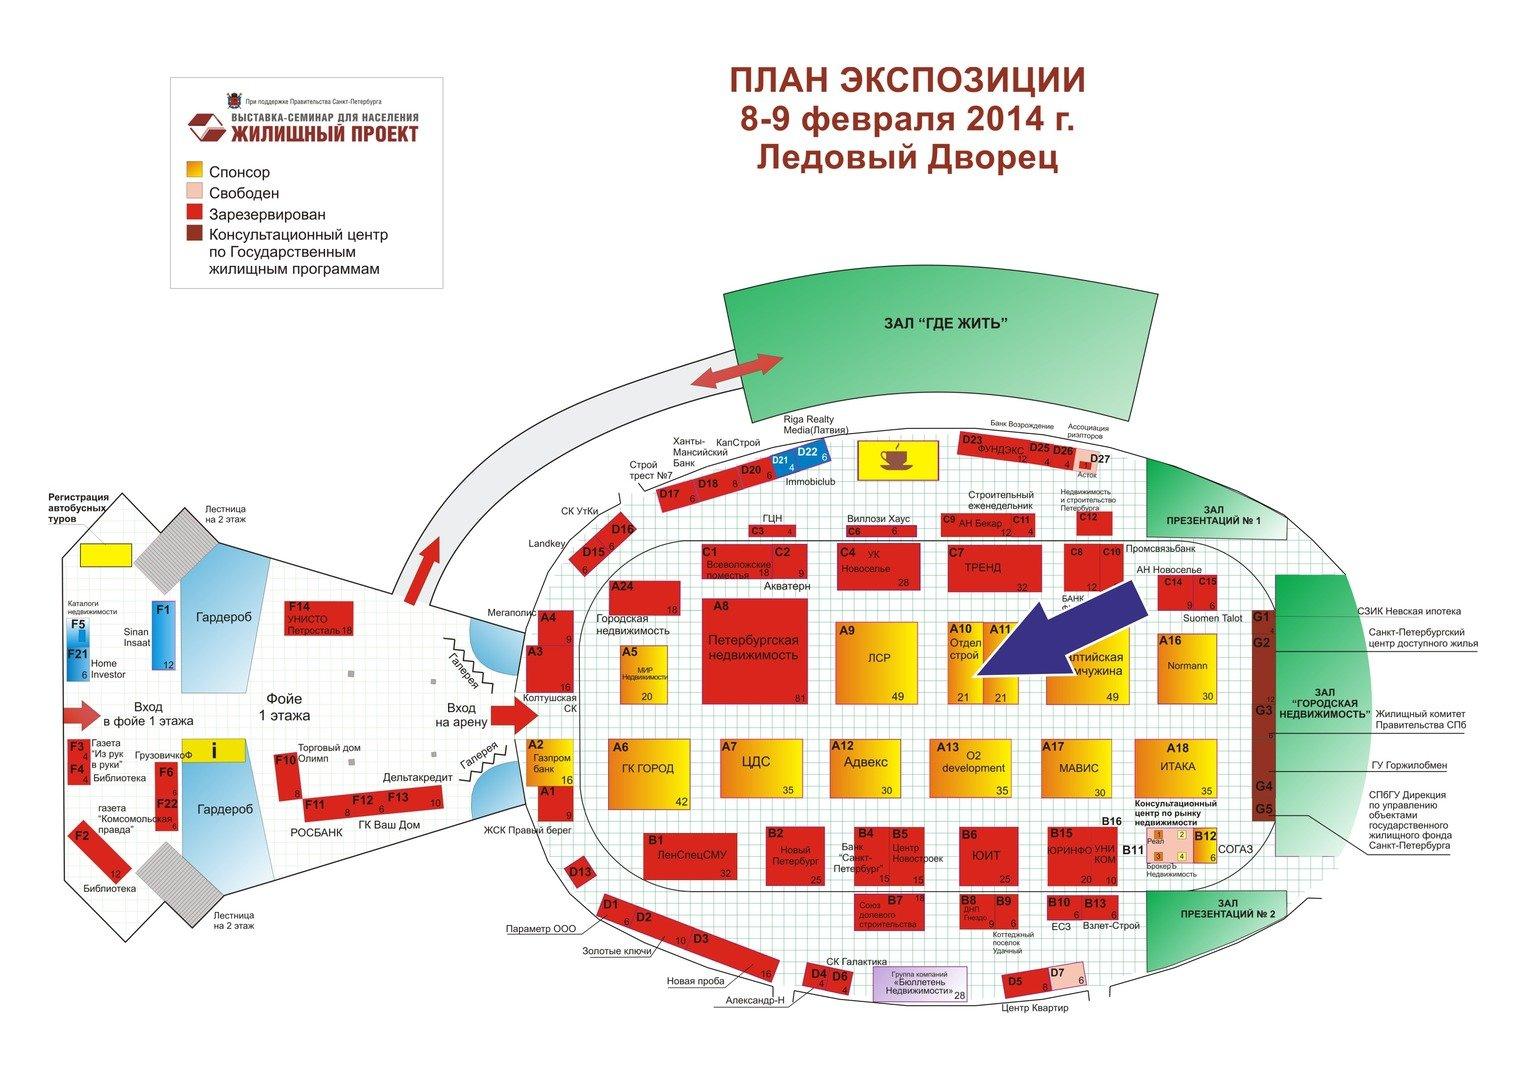 Схема зала ледового дворца с местами